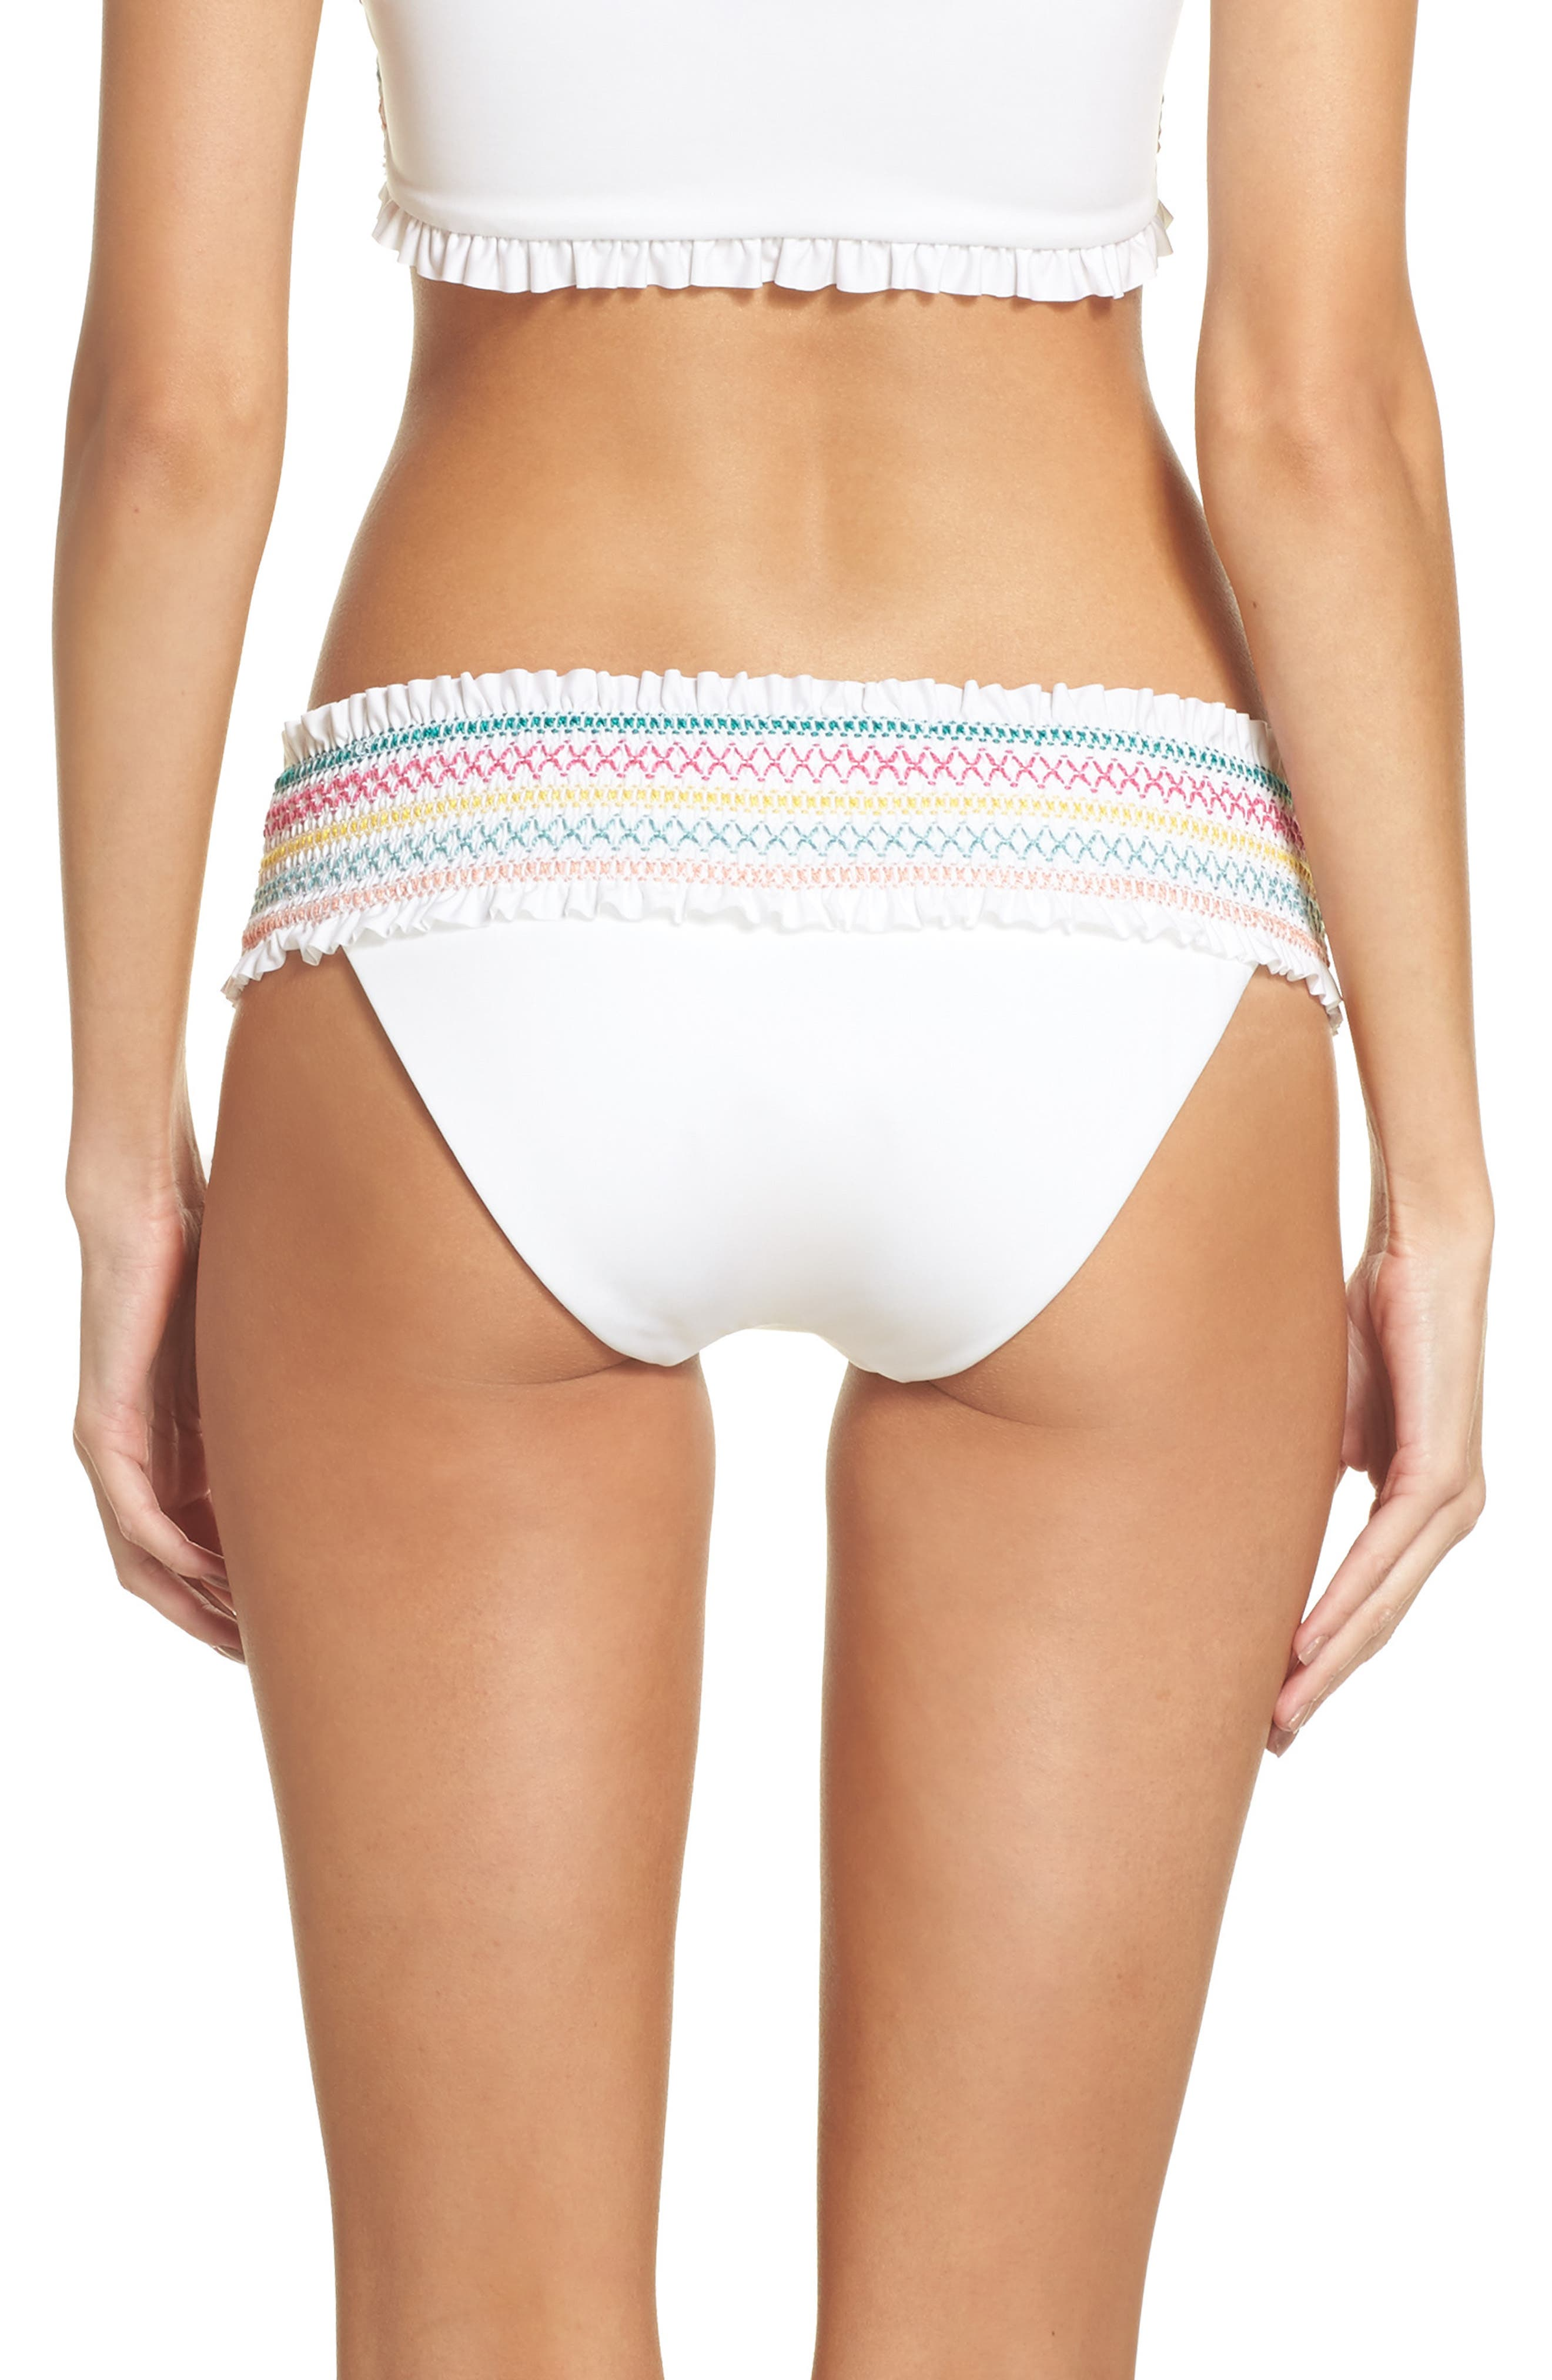 Crystal Cove Smocked Bikini Bottoms,                             Alternate thumbnail 2, color,